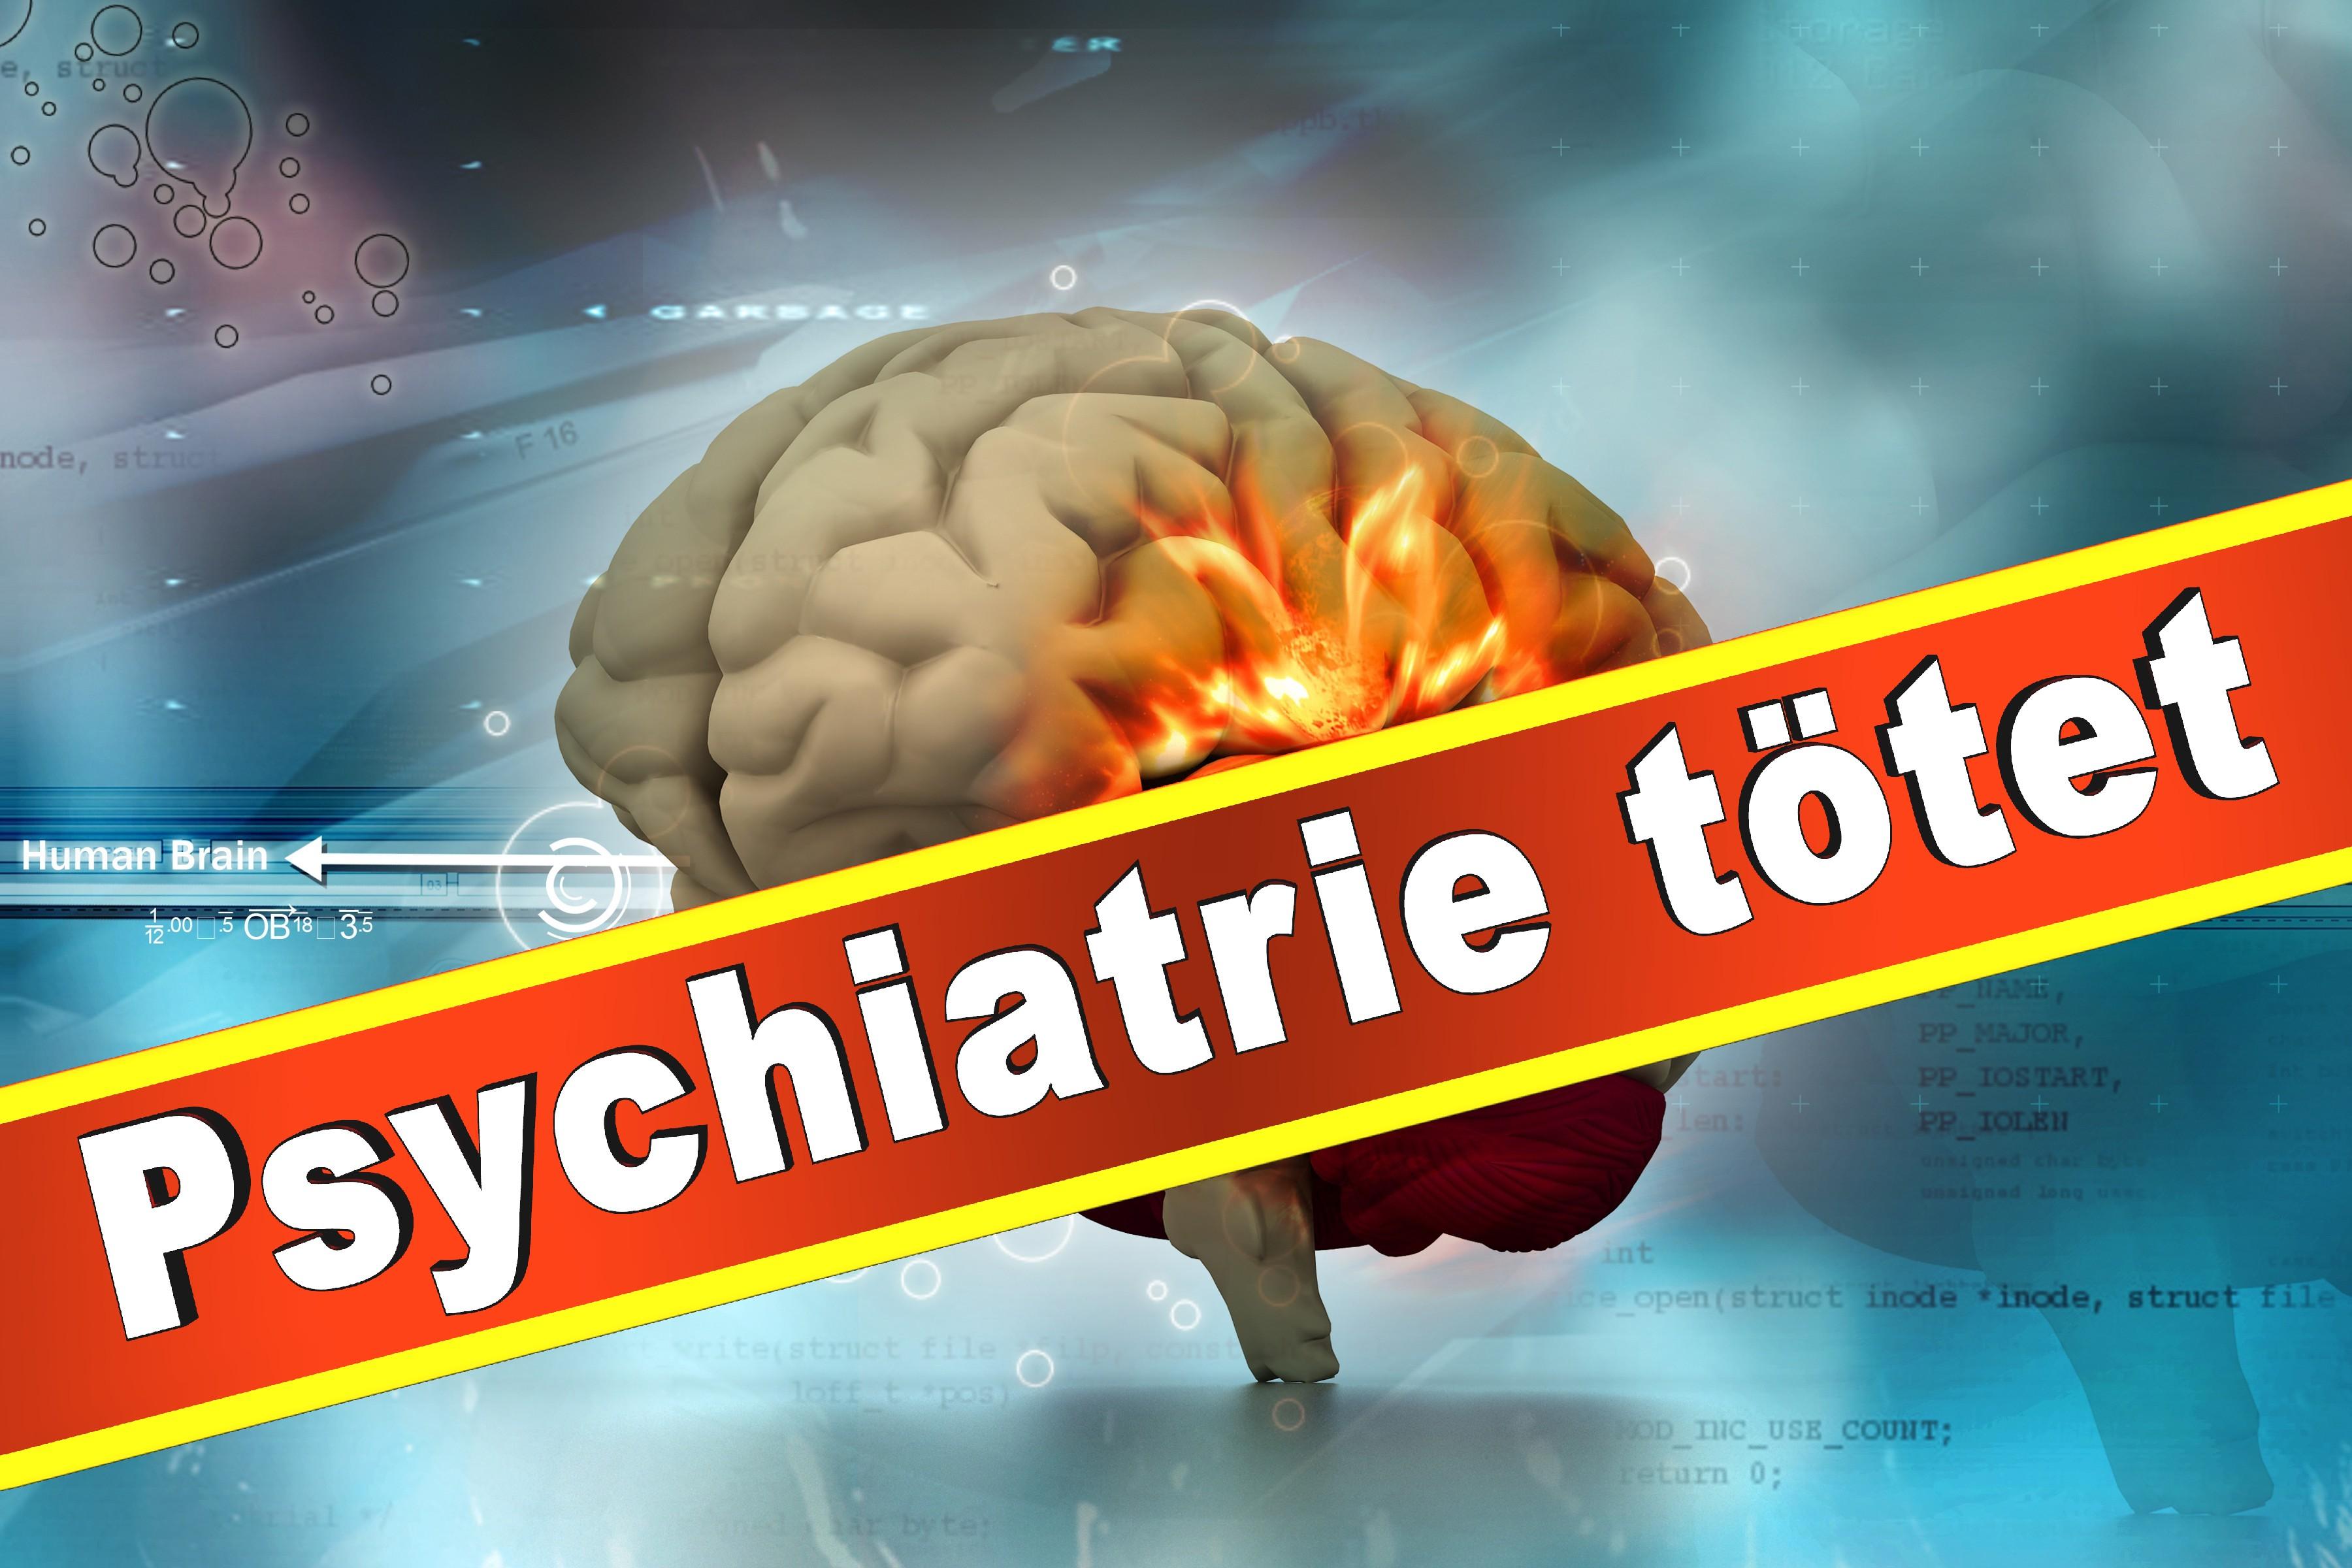 Coaching Paarberatung Und Psychotherapie In Hannover Psychotherapeut Hannover Psychotherapie